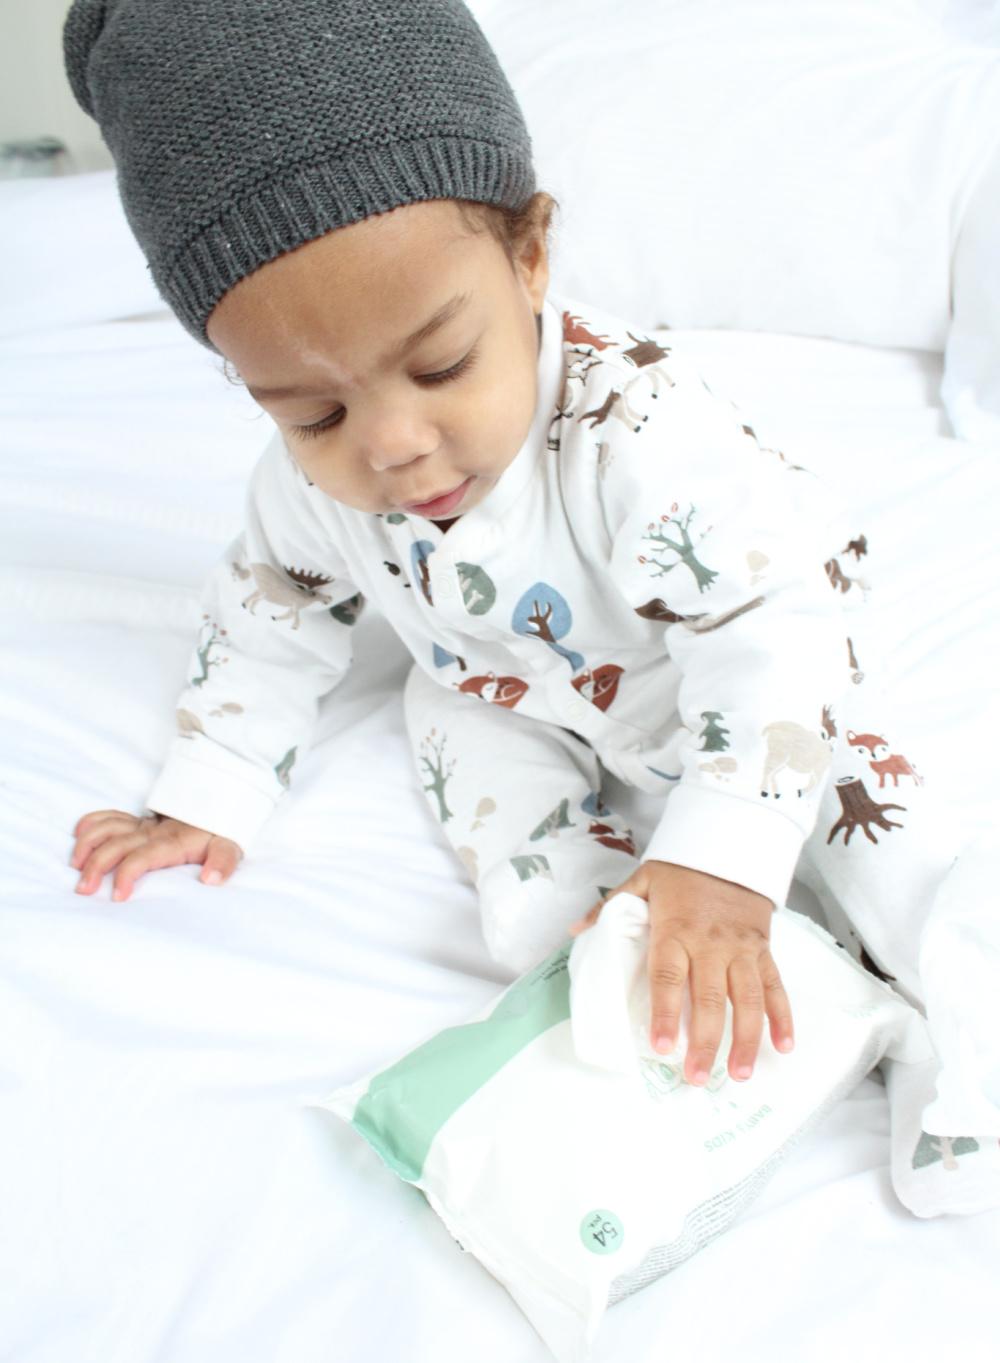 Naif-Babydoekjes-plastic-vrij-ervaring-review-themillennialmom